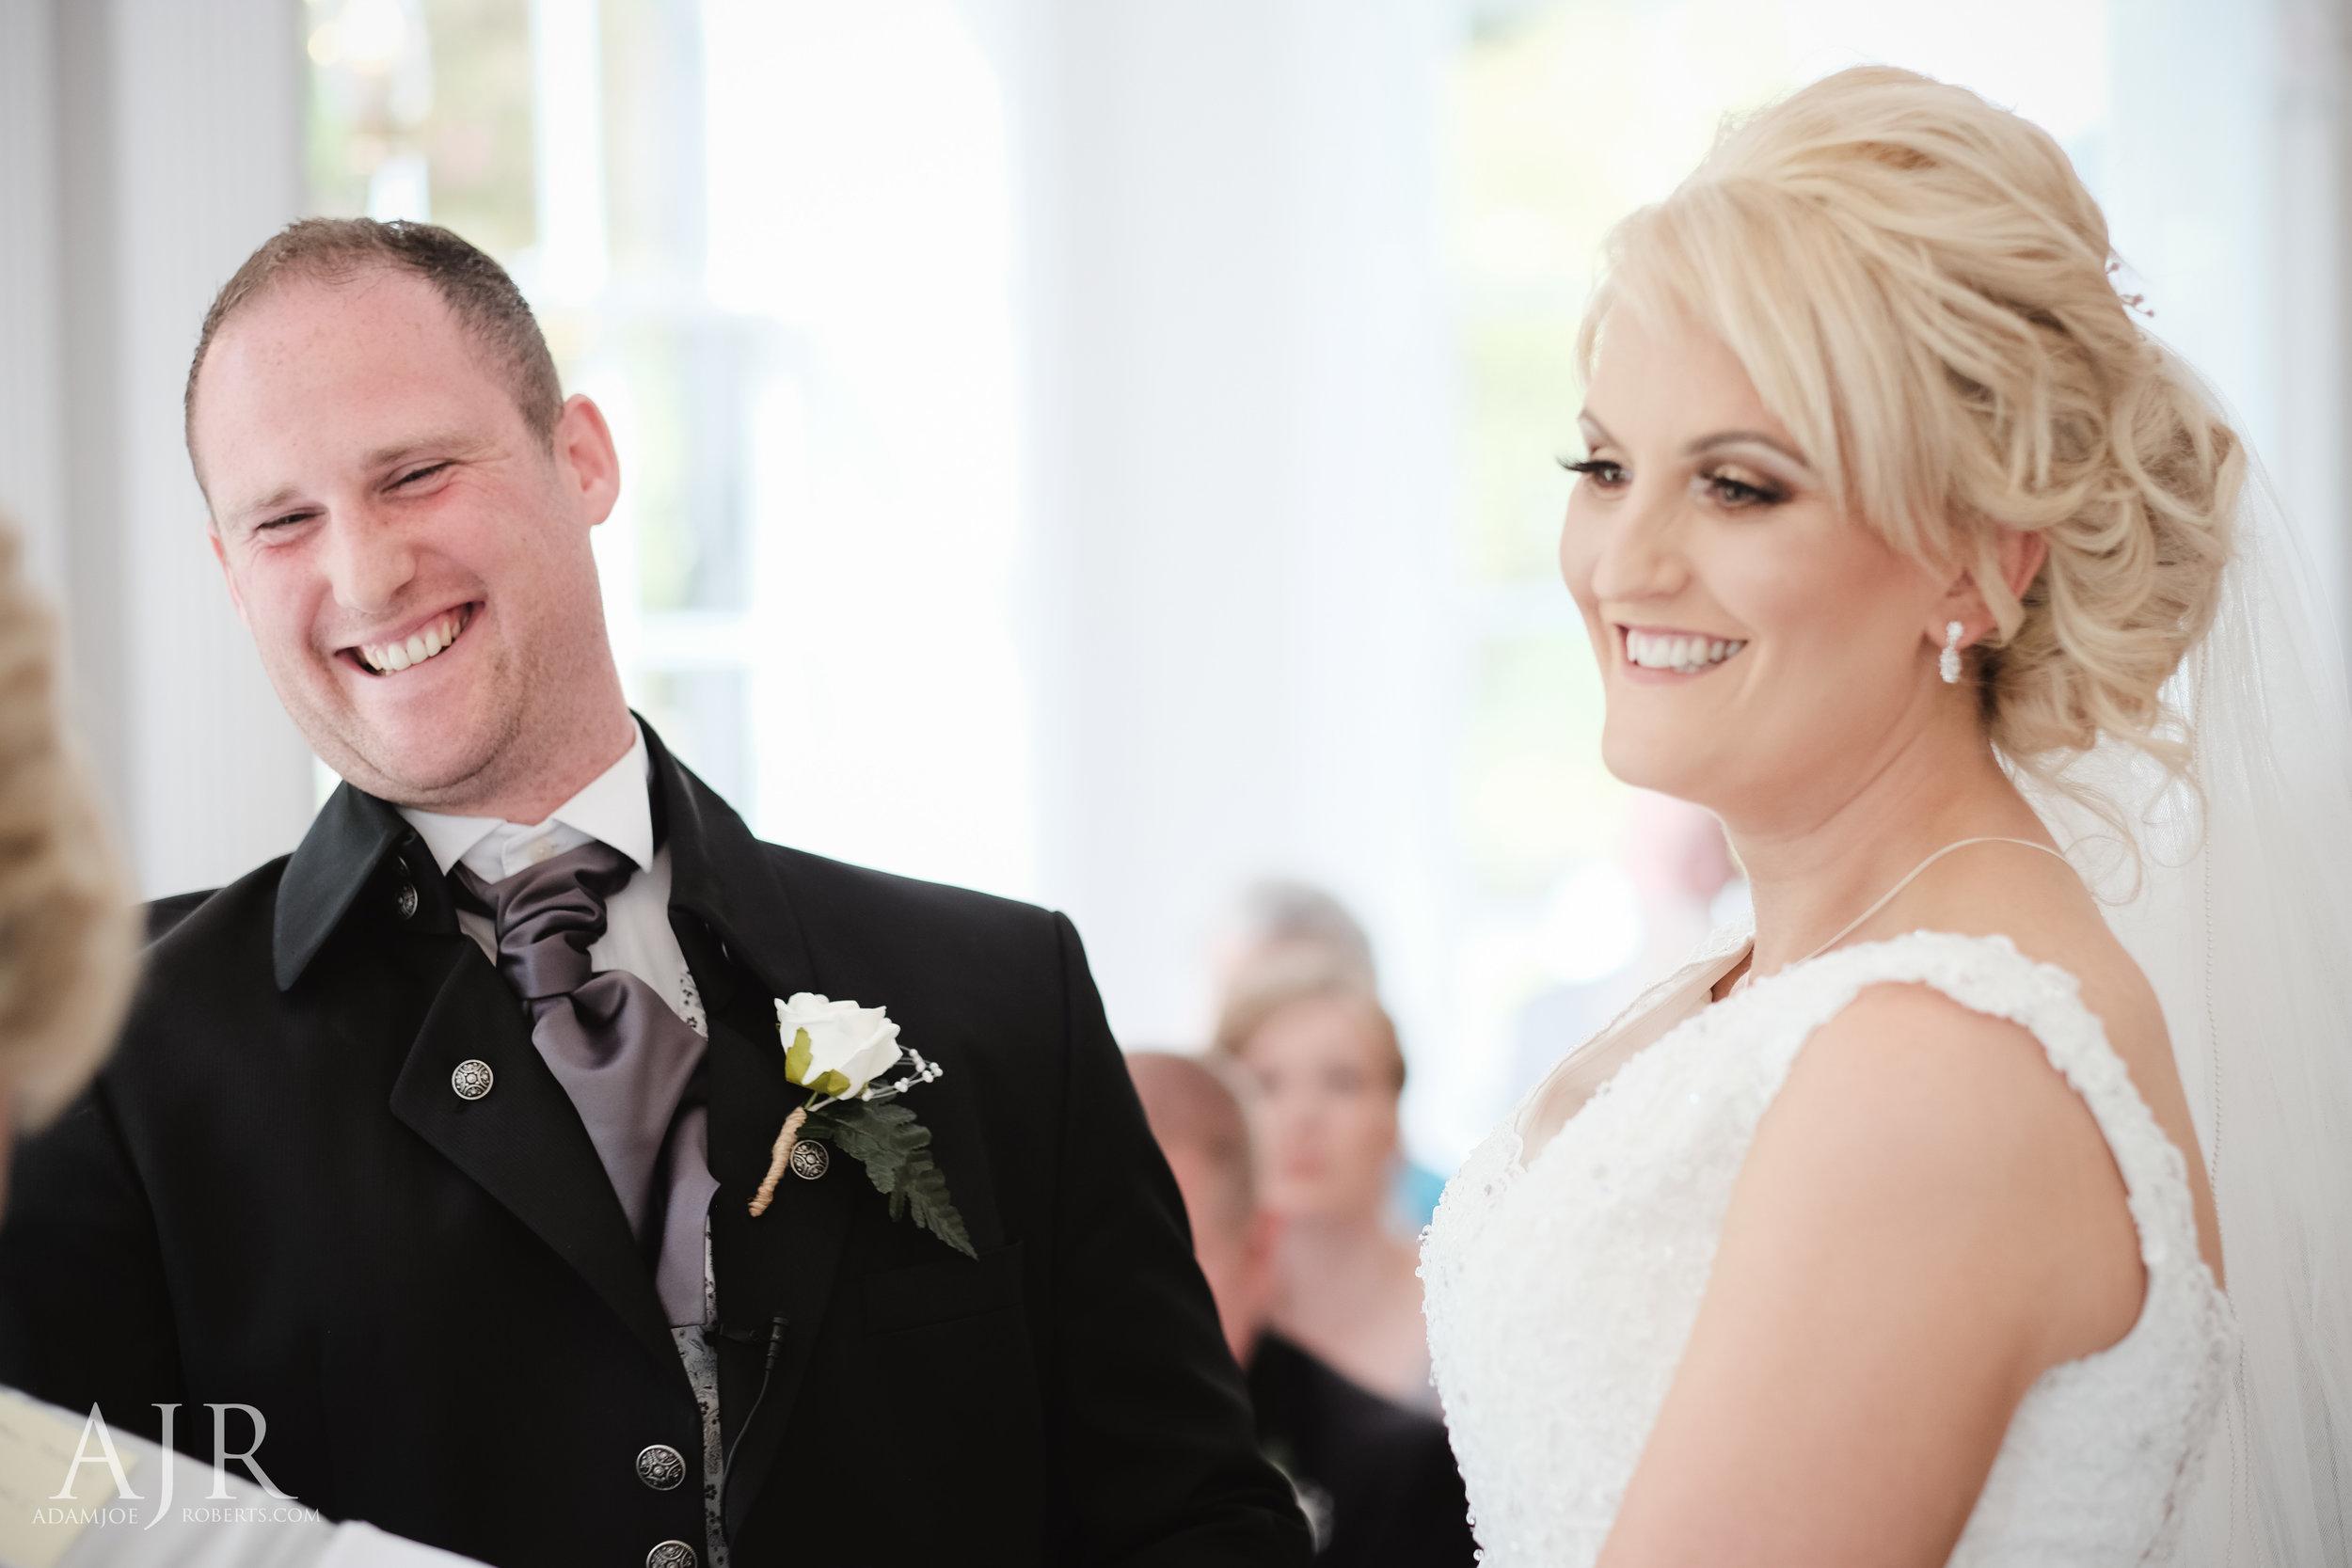 statham lodge wedding photographer cheshire wedding photographer (7 of 11).jpg